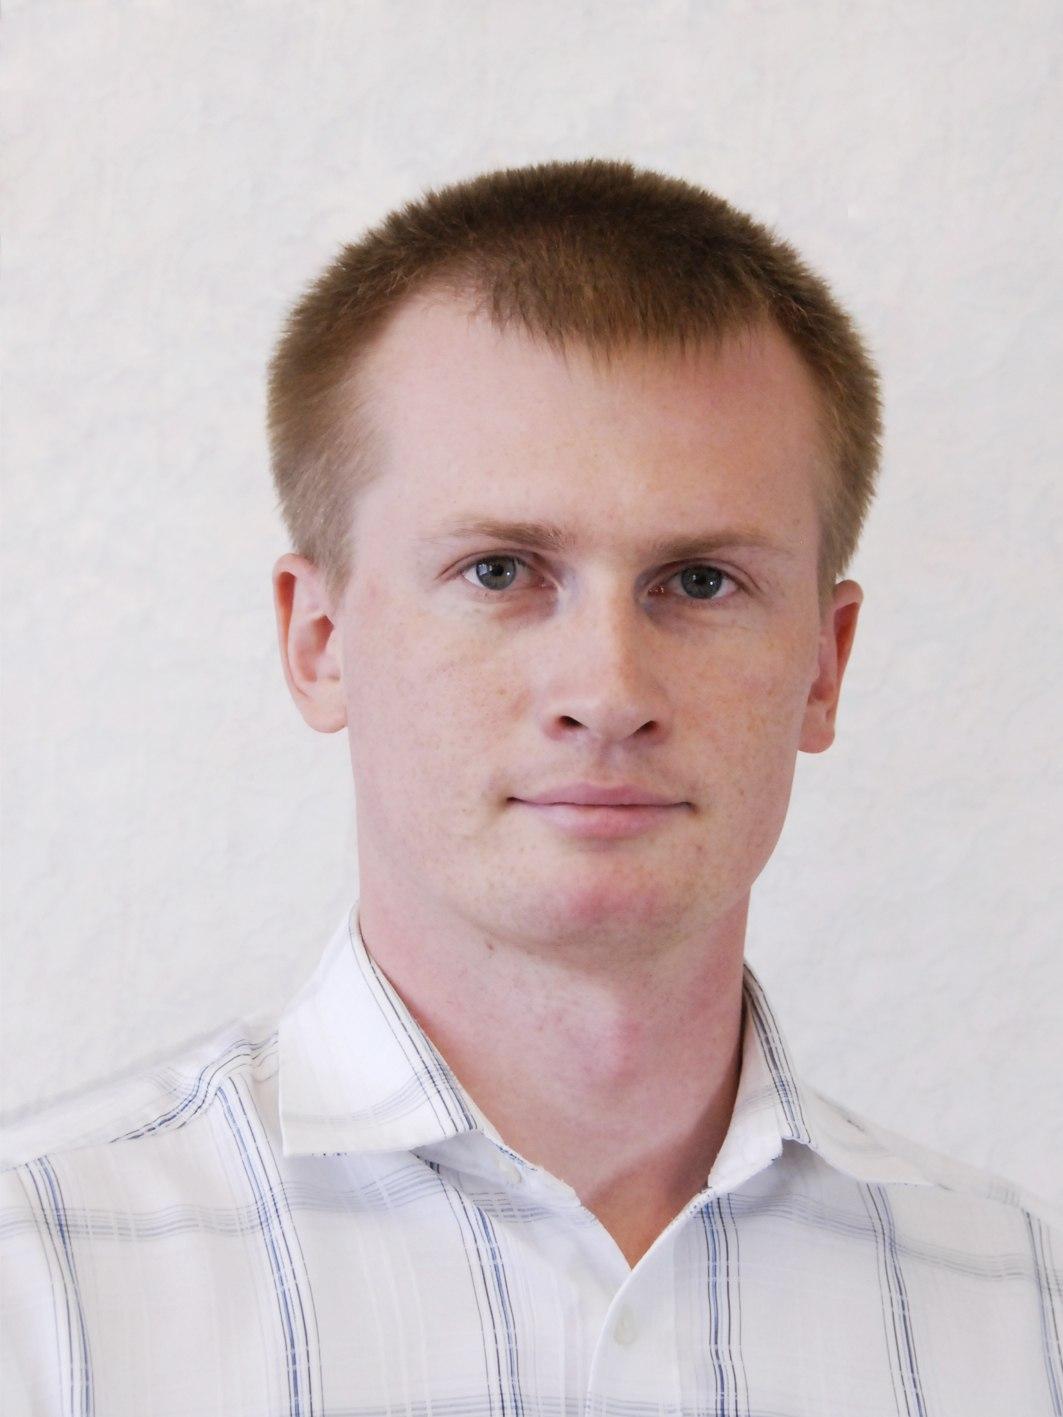 Полетаев Романа Анатольевич - юрист ТГО ВОИ